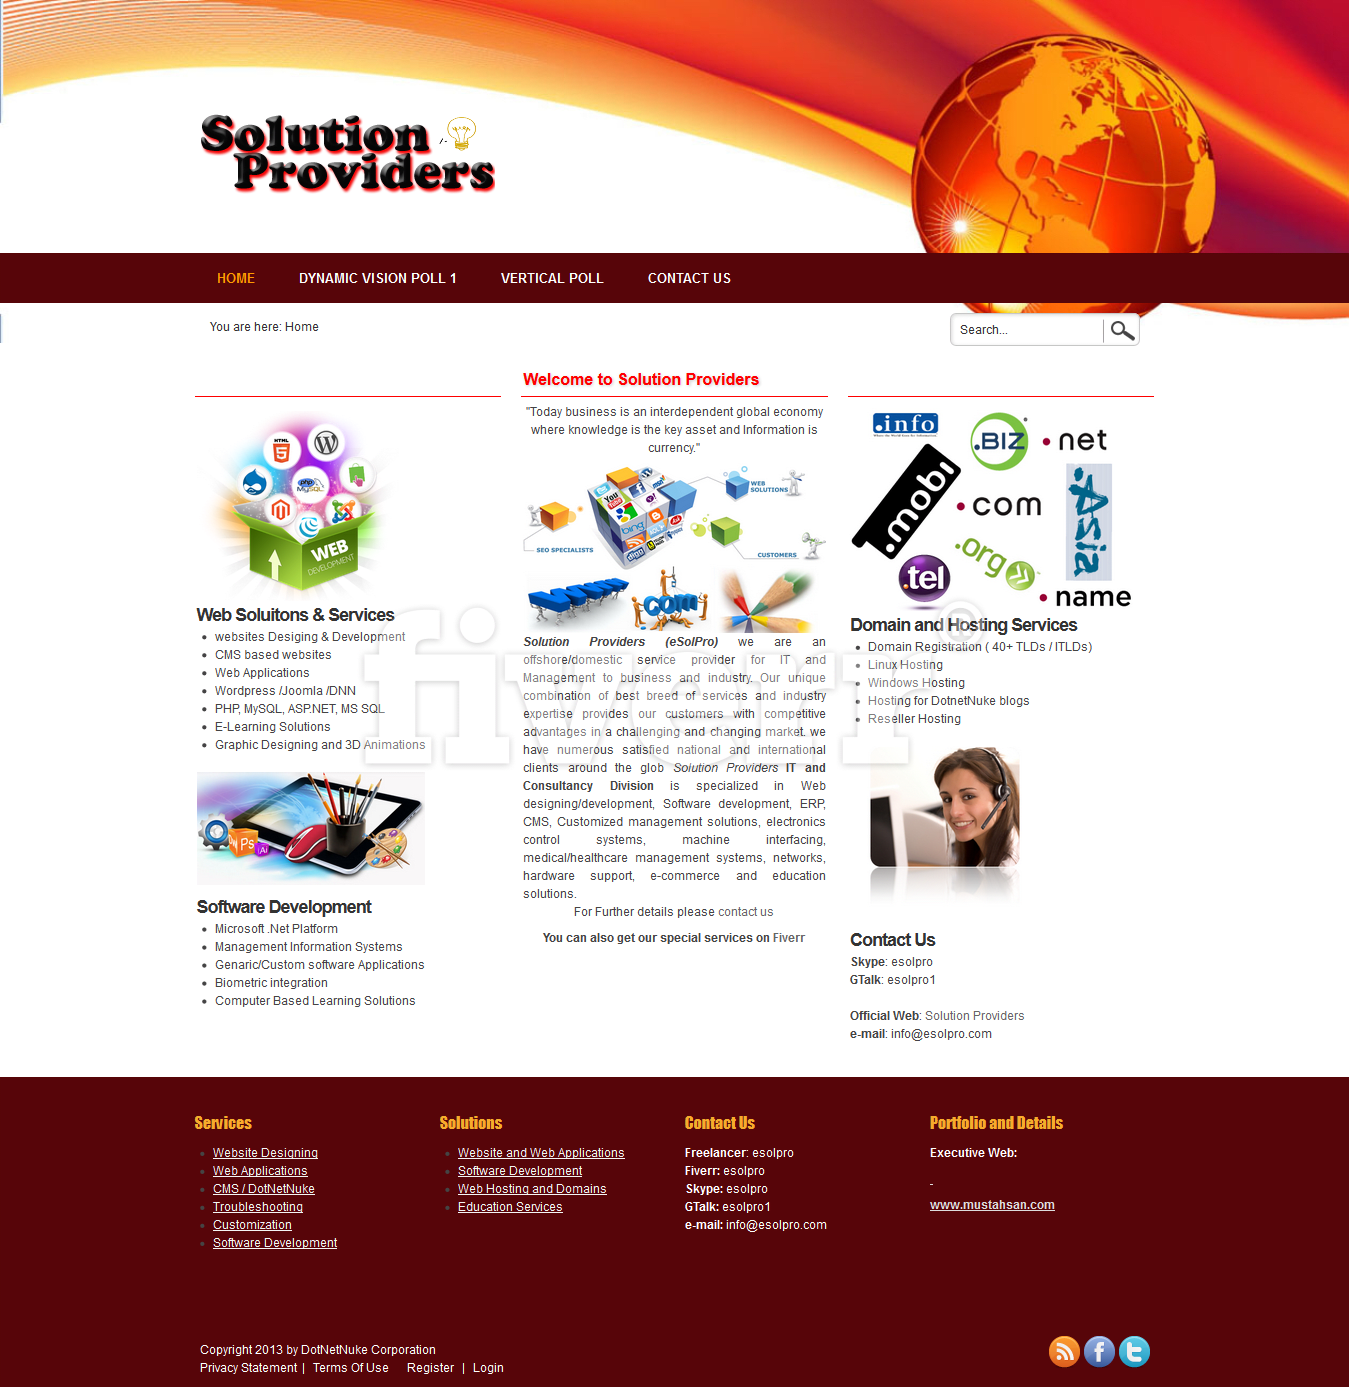 Fix dotnetnuke dnn evoq website skin and module issues by Esolpro